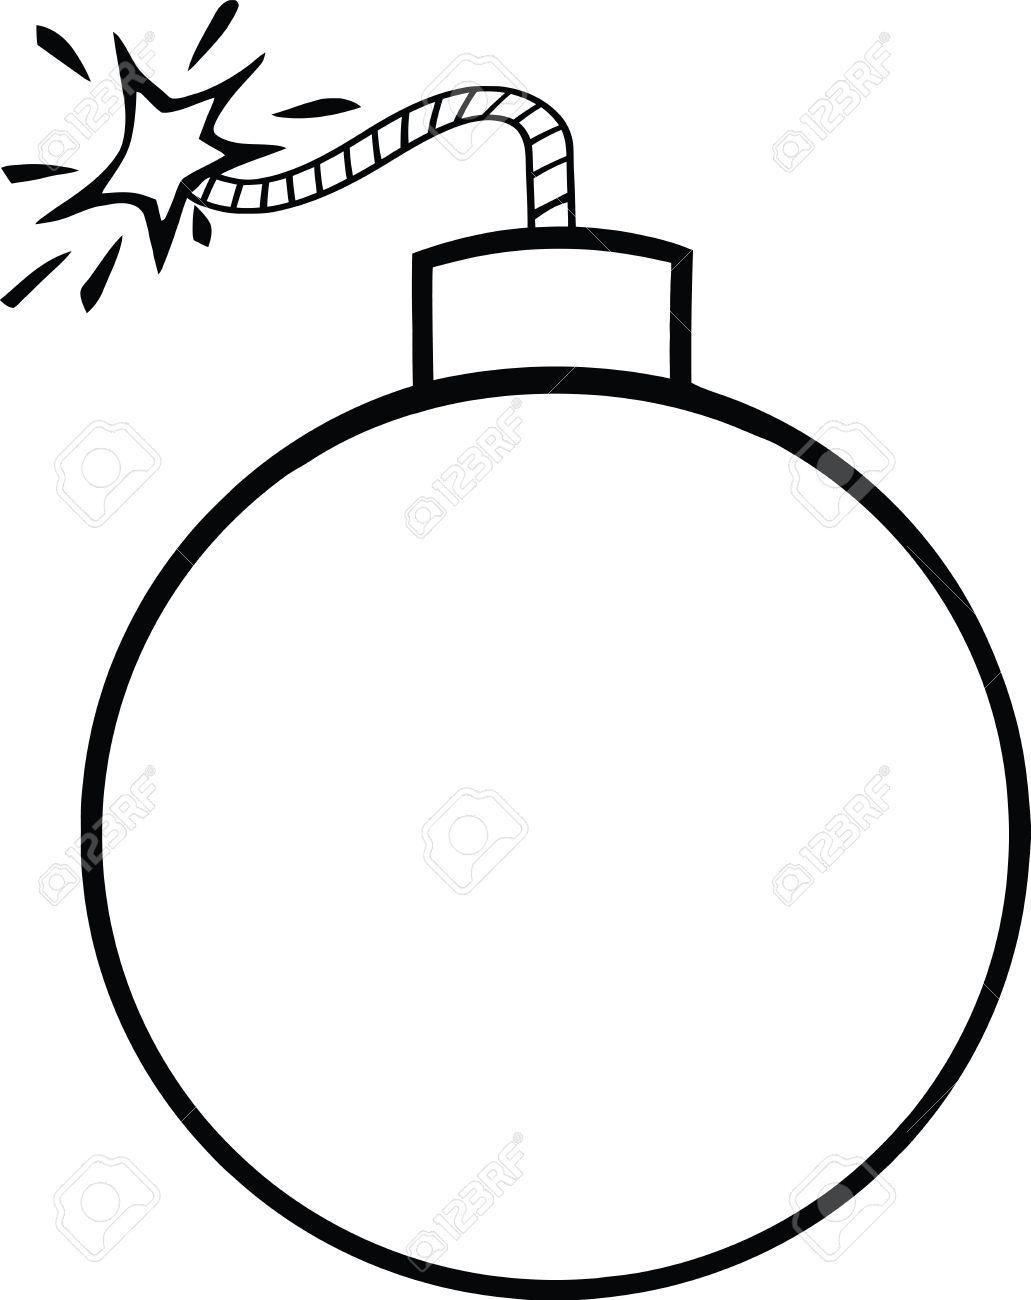 cartoon bomb drawing at getdrawings com